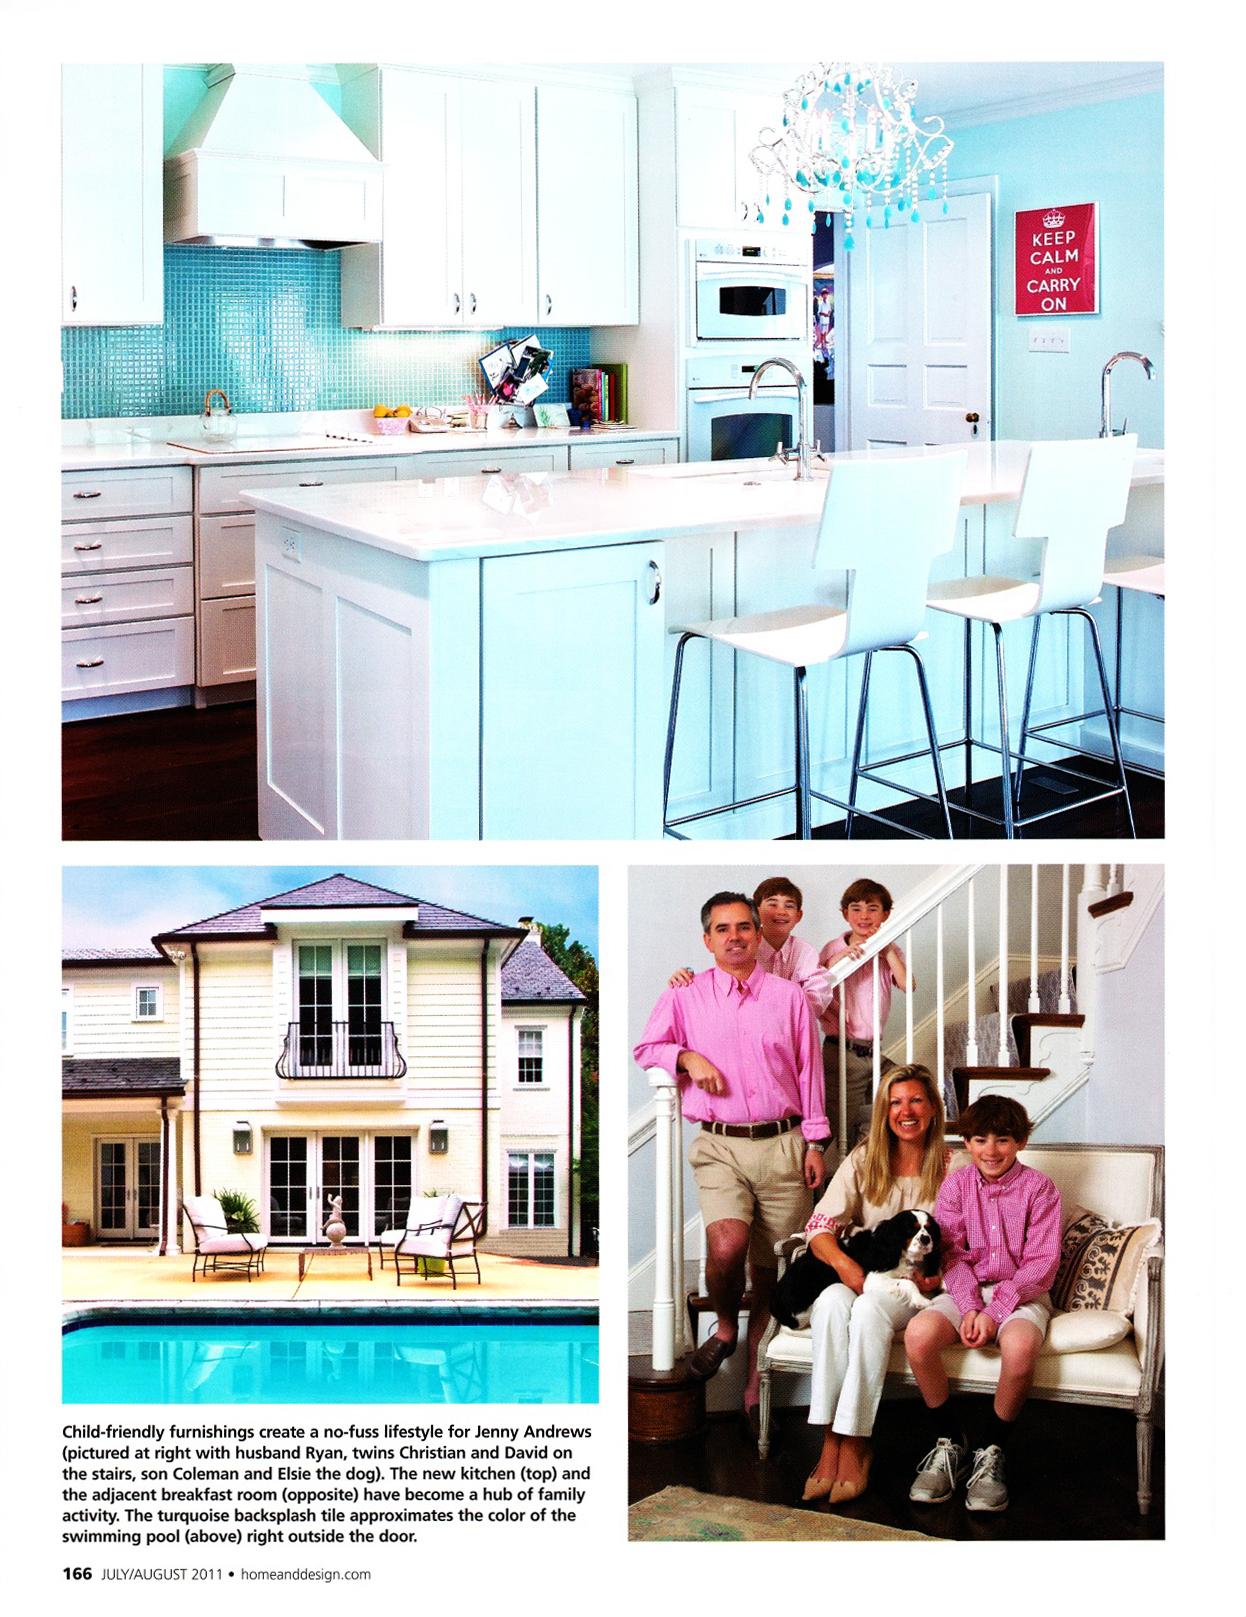 Home and Design Summer 2011_0005.jpg